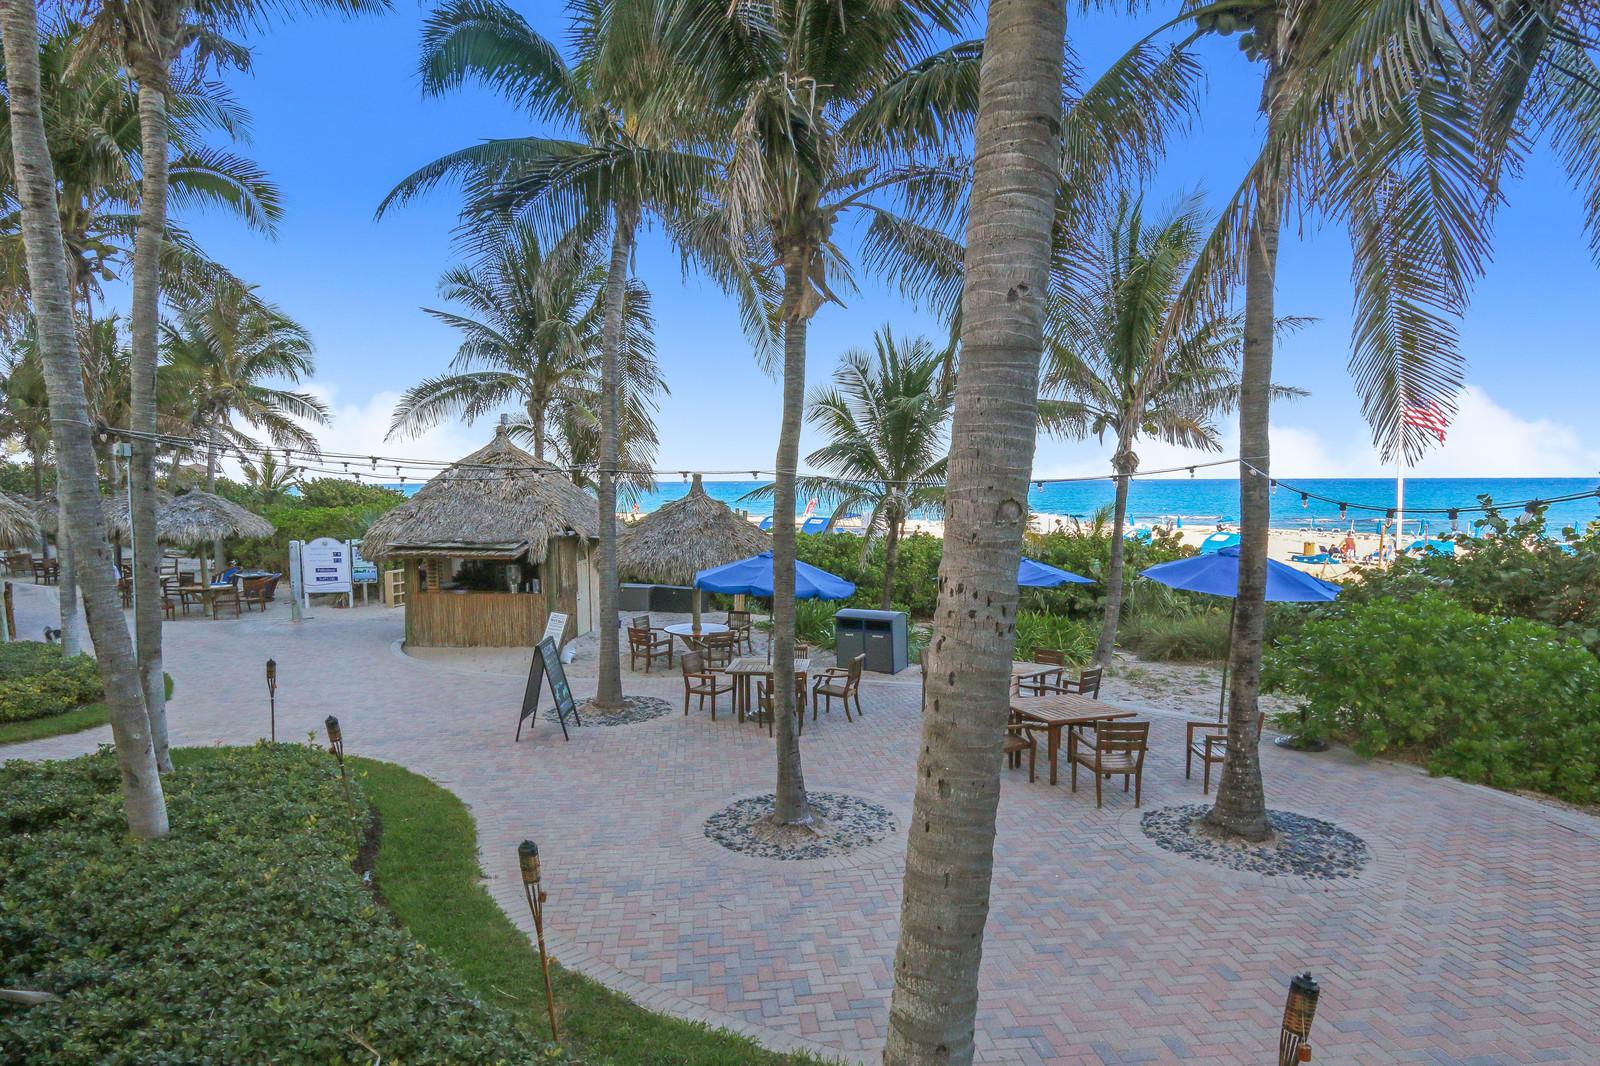 THE RESORT SINGER ISLAND FLORIDA